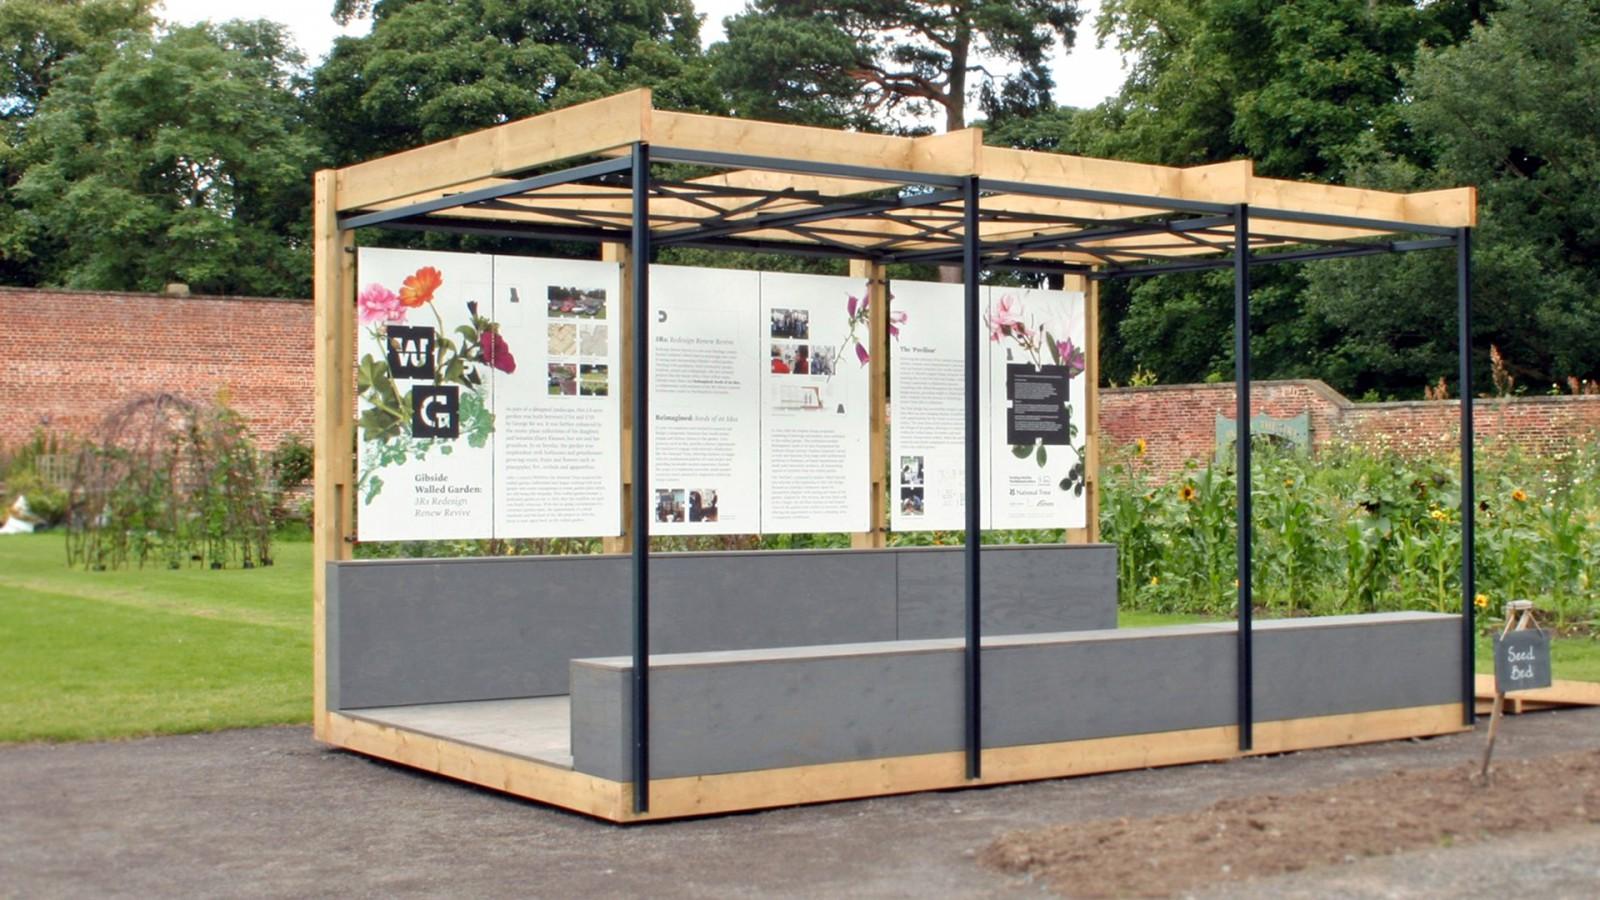 gibside pavillion 2 -  image for Gibside National Trust – Walled Garden project